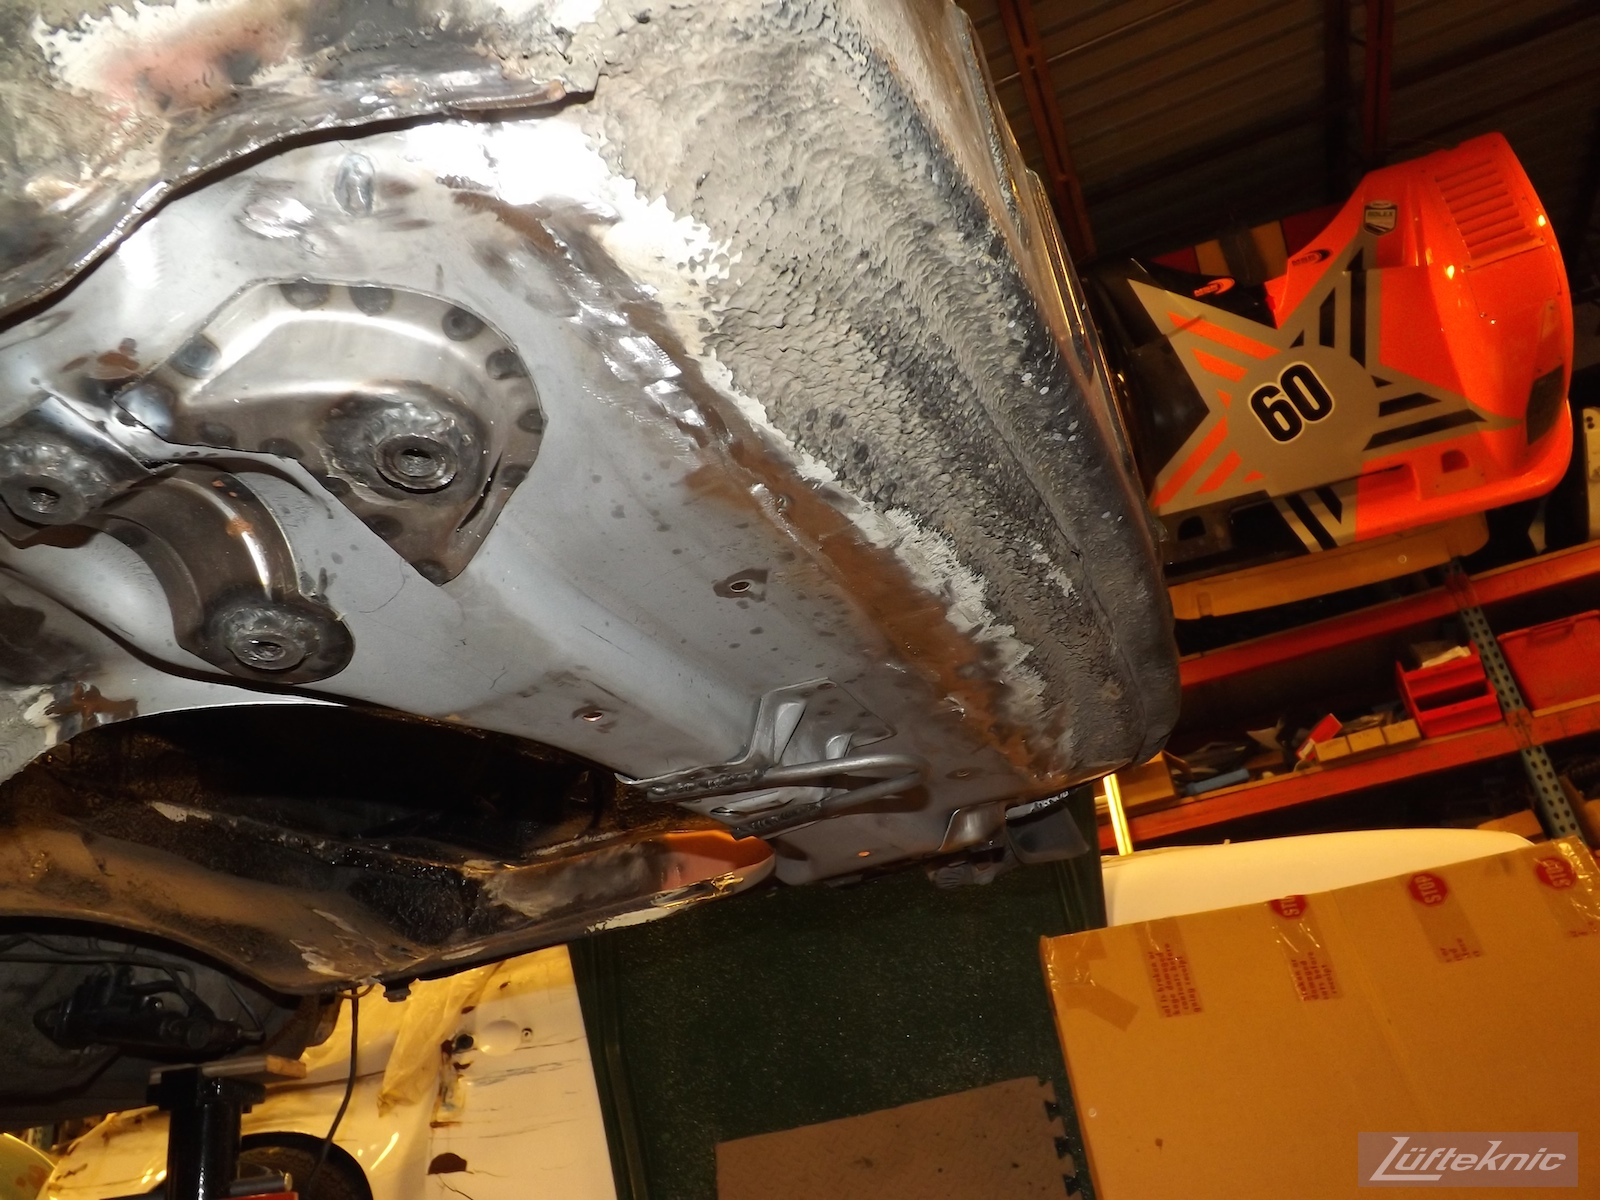 Fresh front pan installed on an Irish Green Porsche 912 undergoing restoration at Lufteknic.